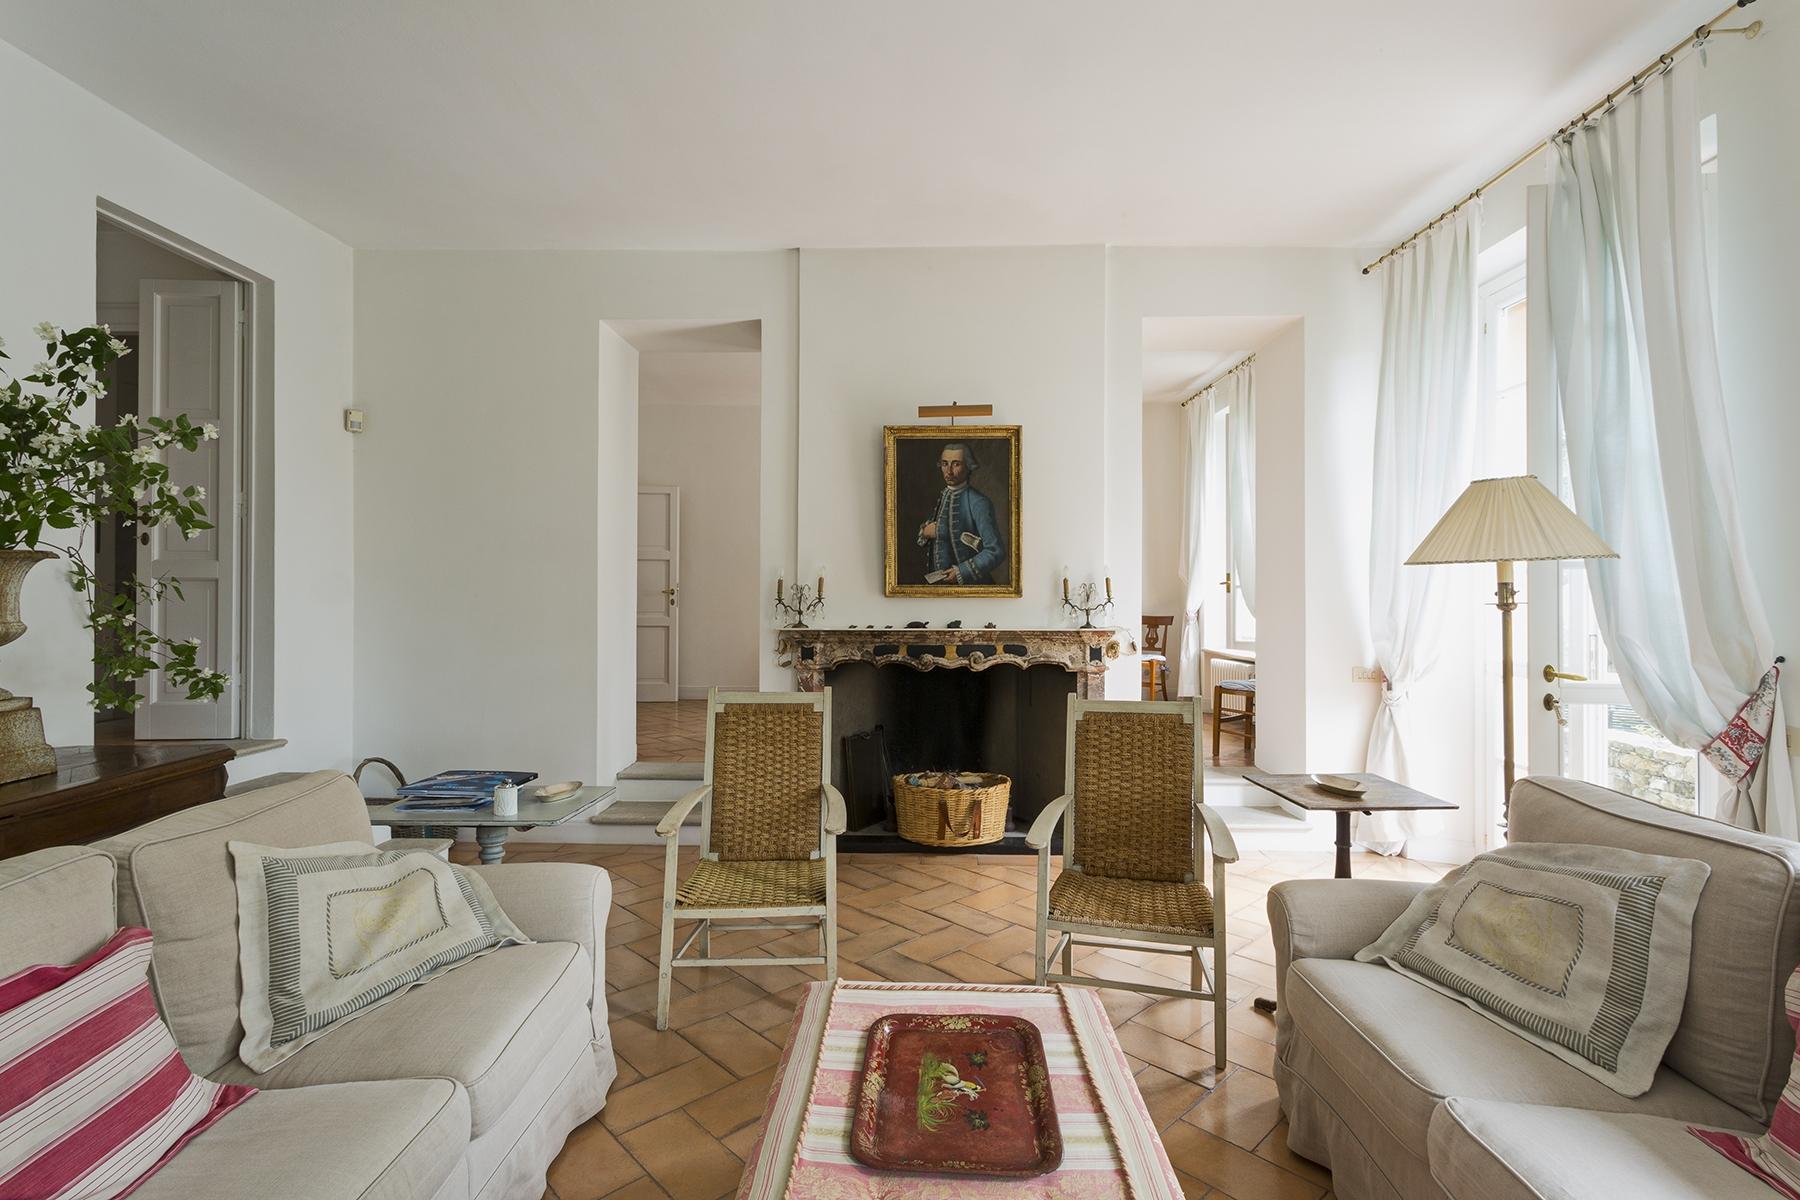 Villa in Vendita a Santa Margherita Ligure: 5 locali, 580 mq - Foto 15